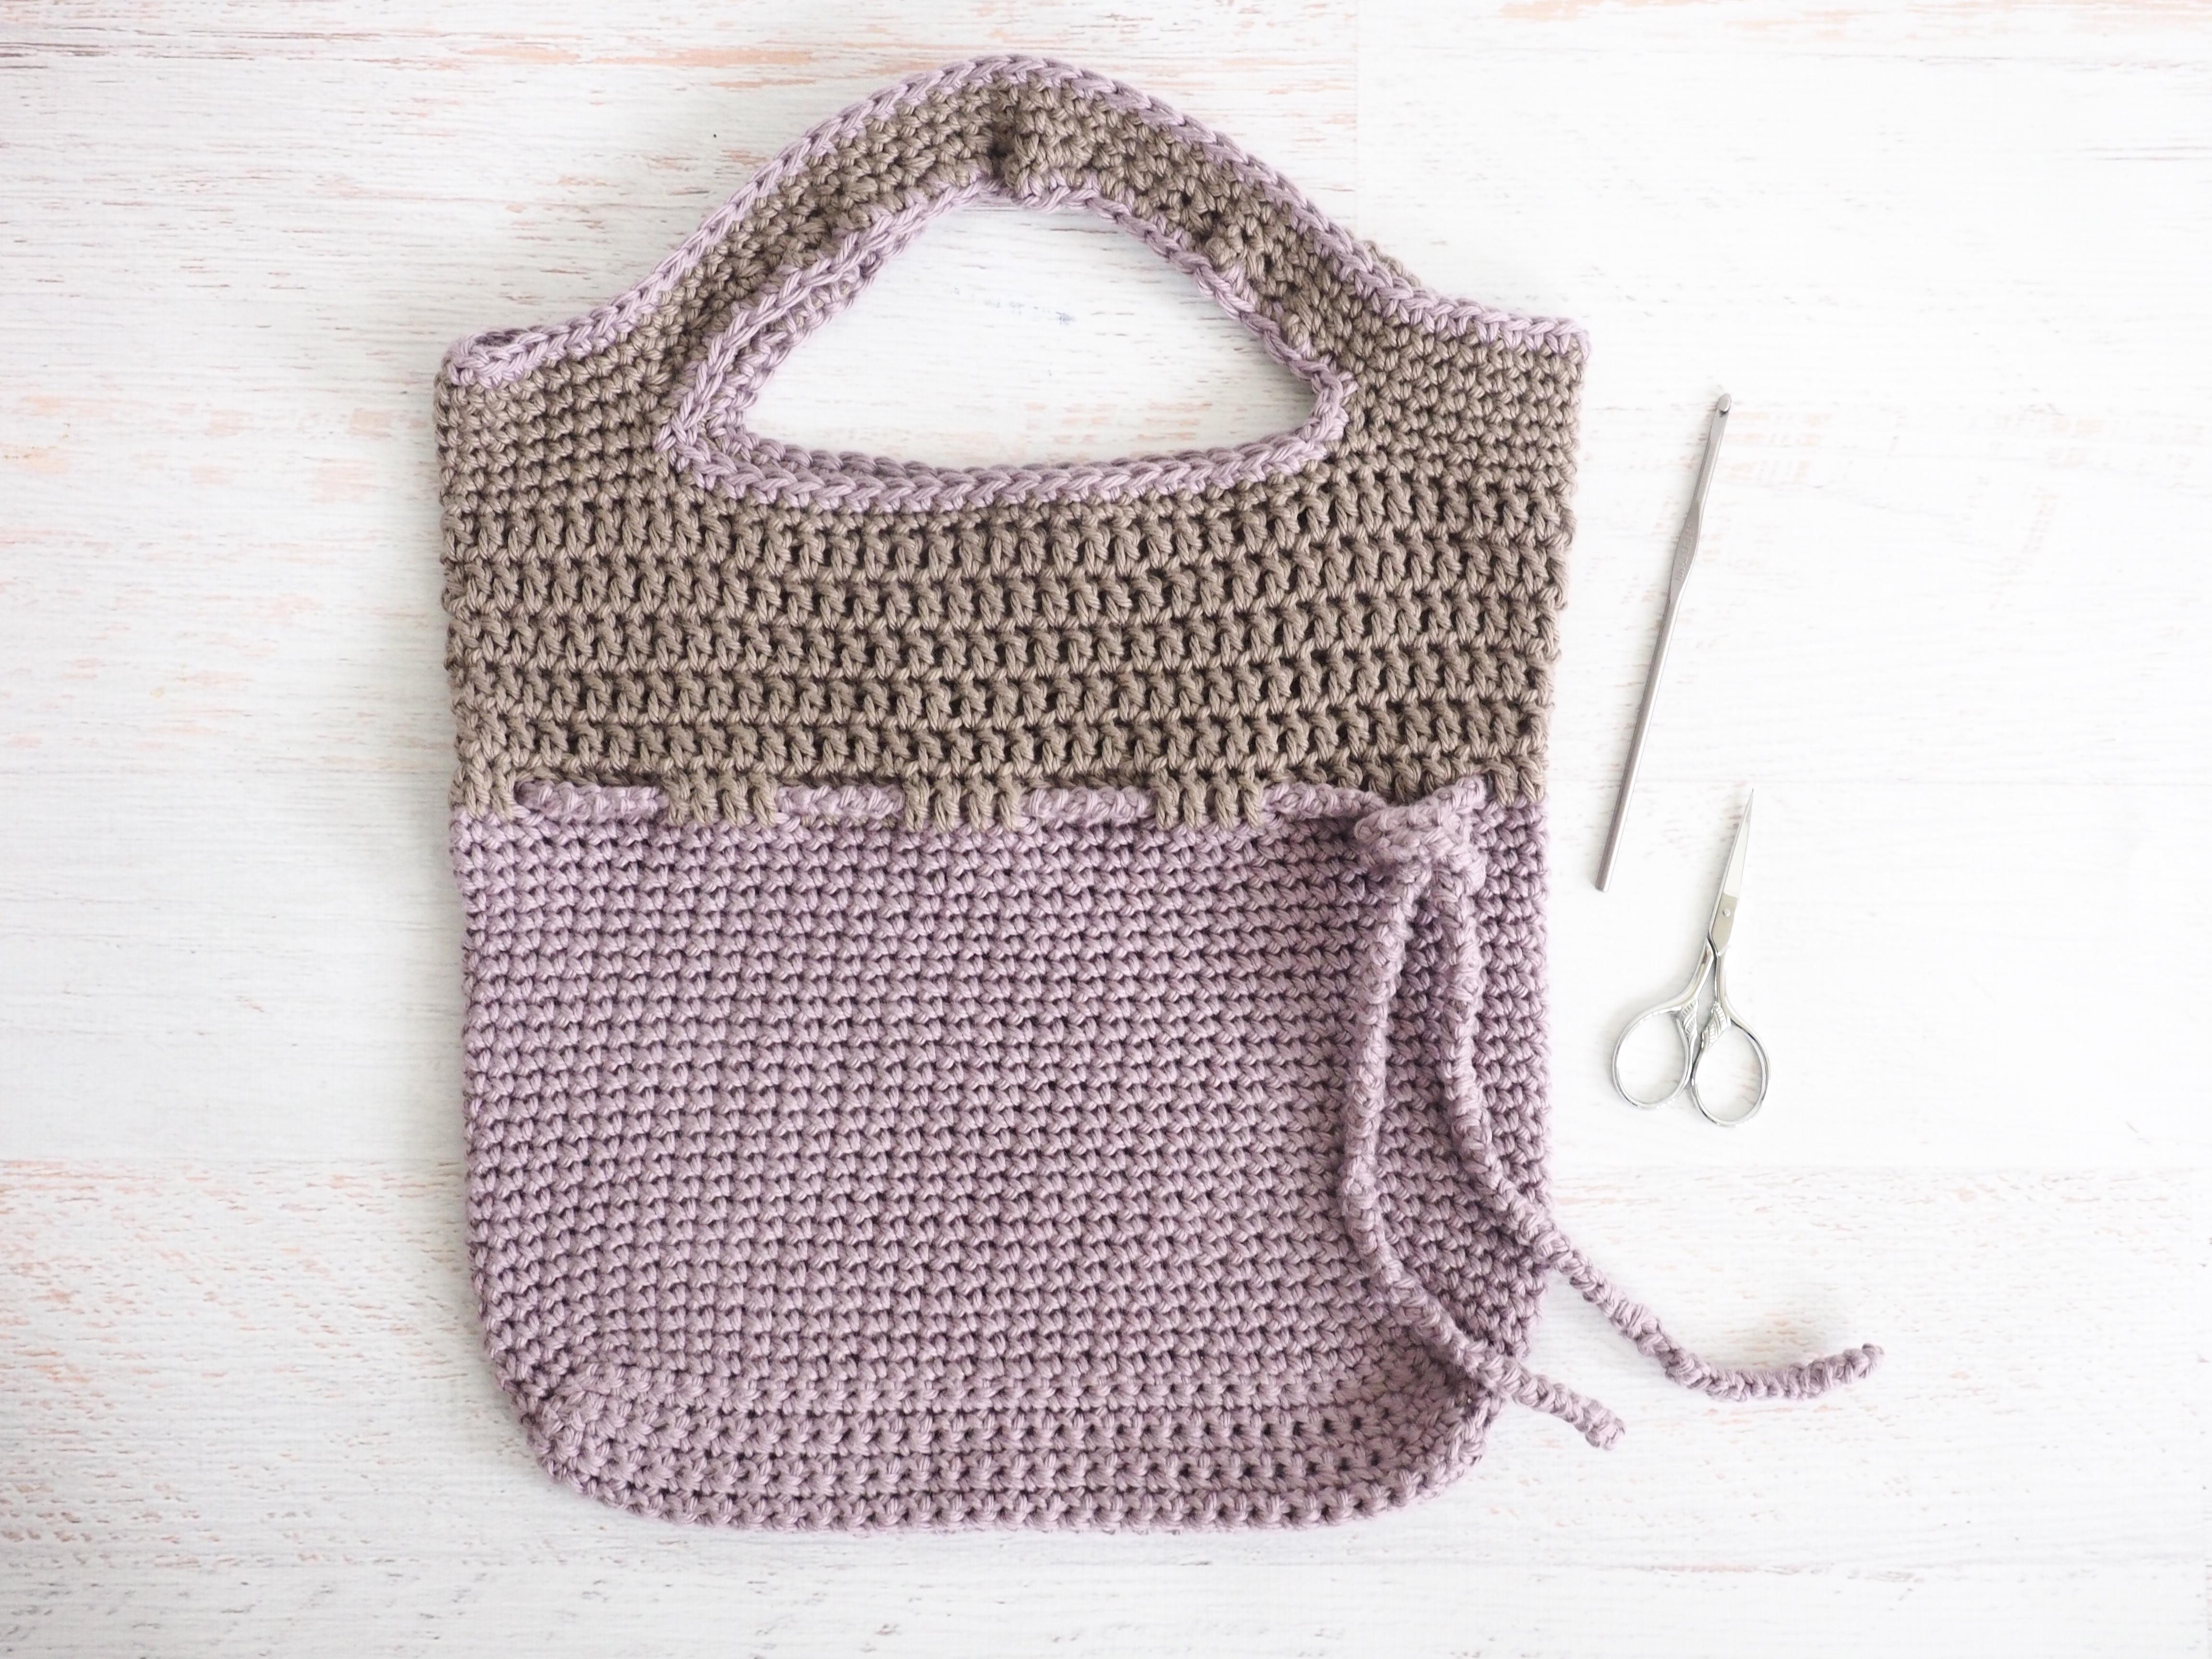 Lilac Roped Bag Crochet Pattern